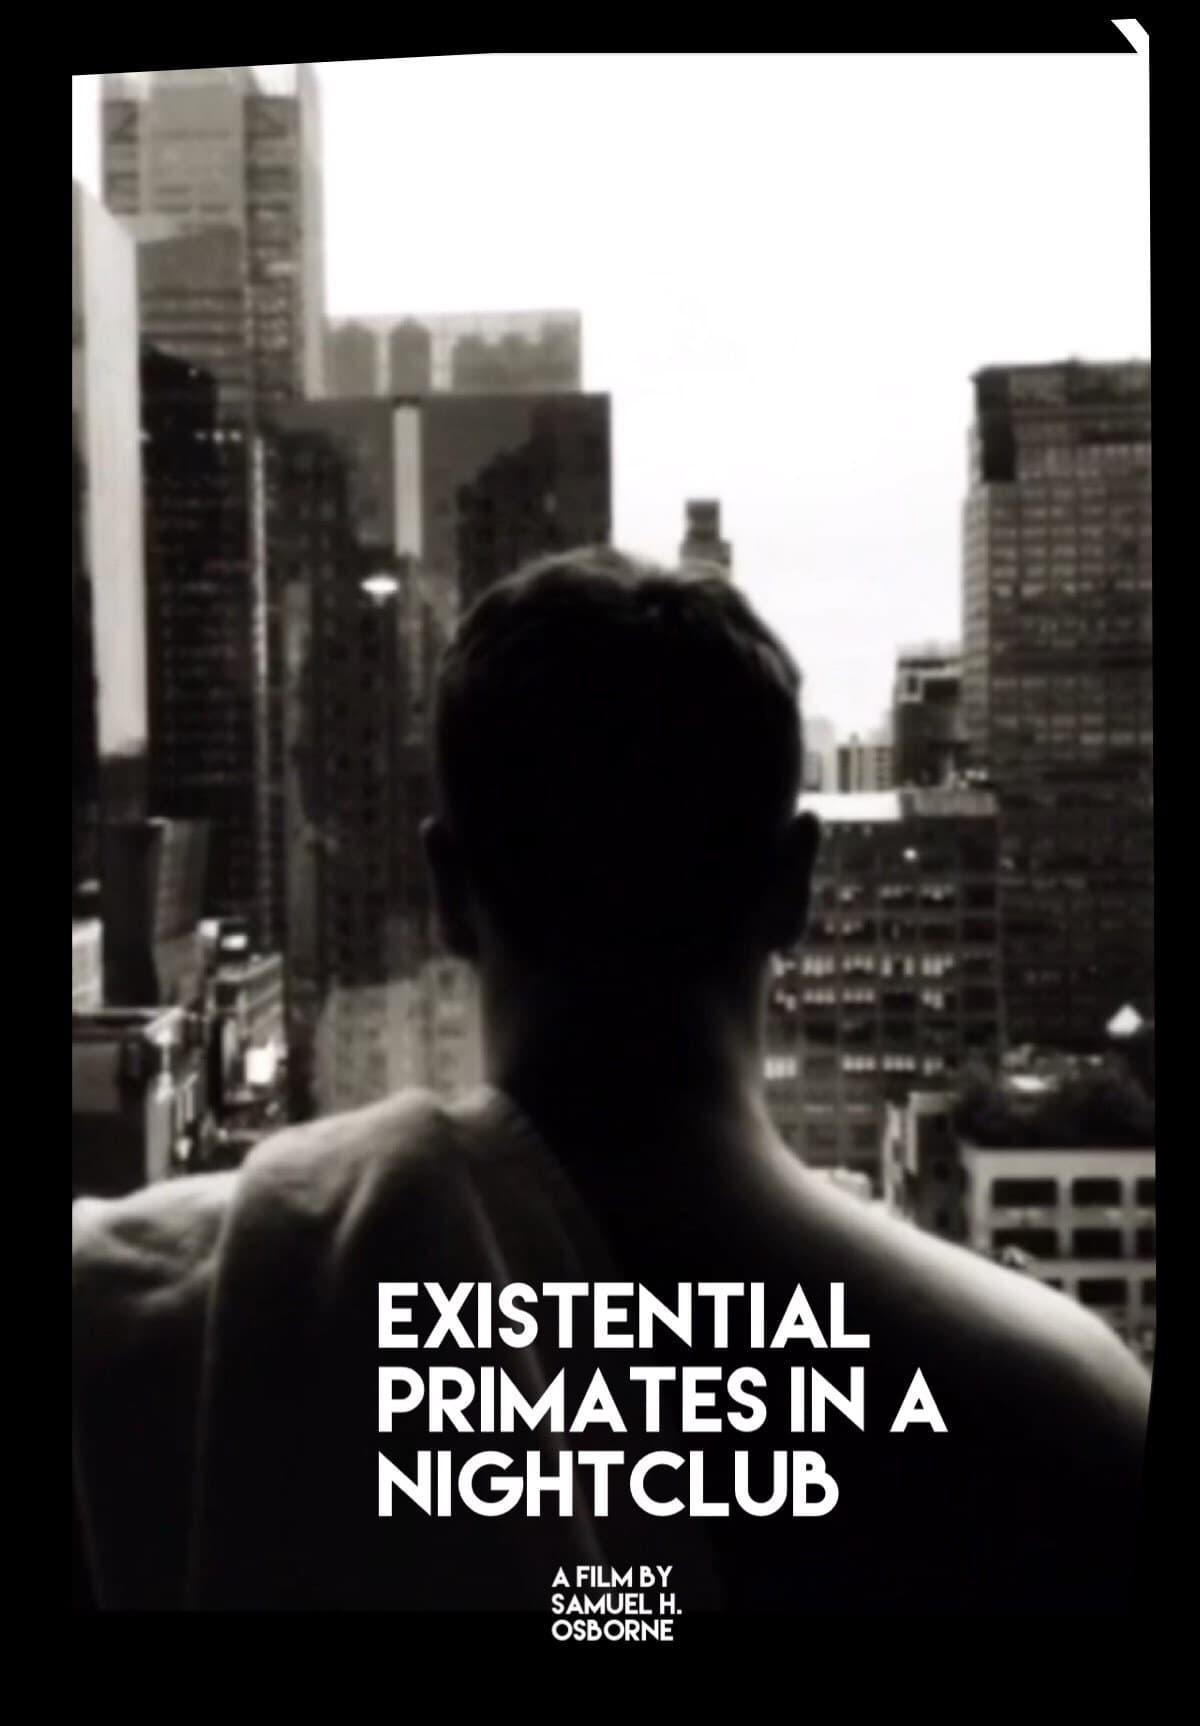 Existential Primates in A Nightclub